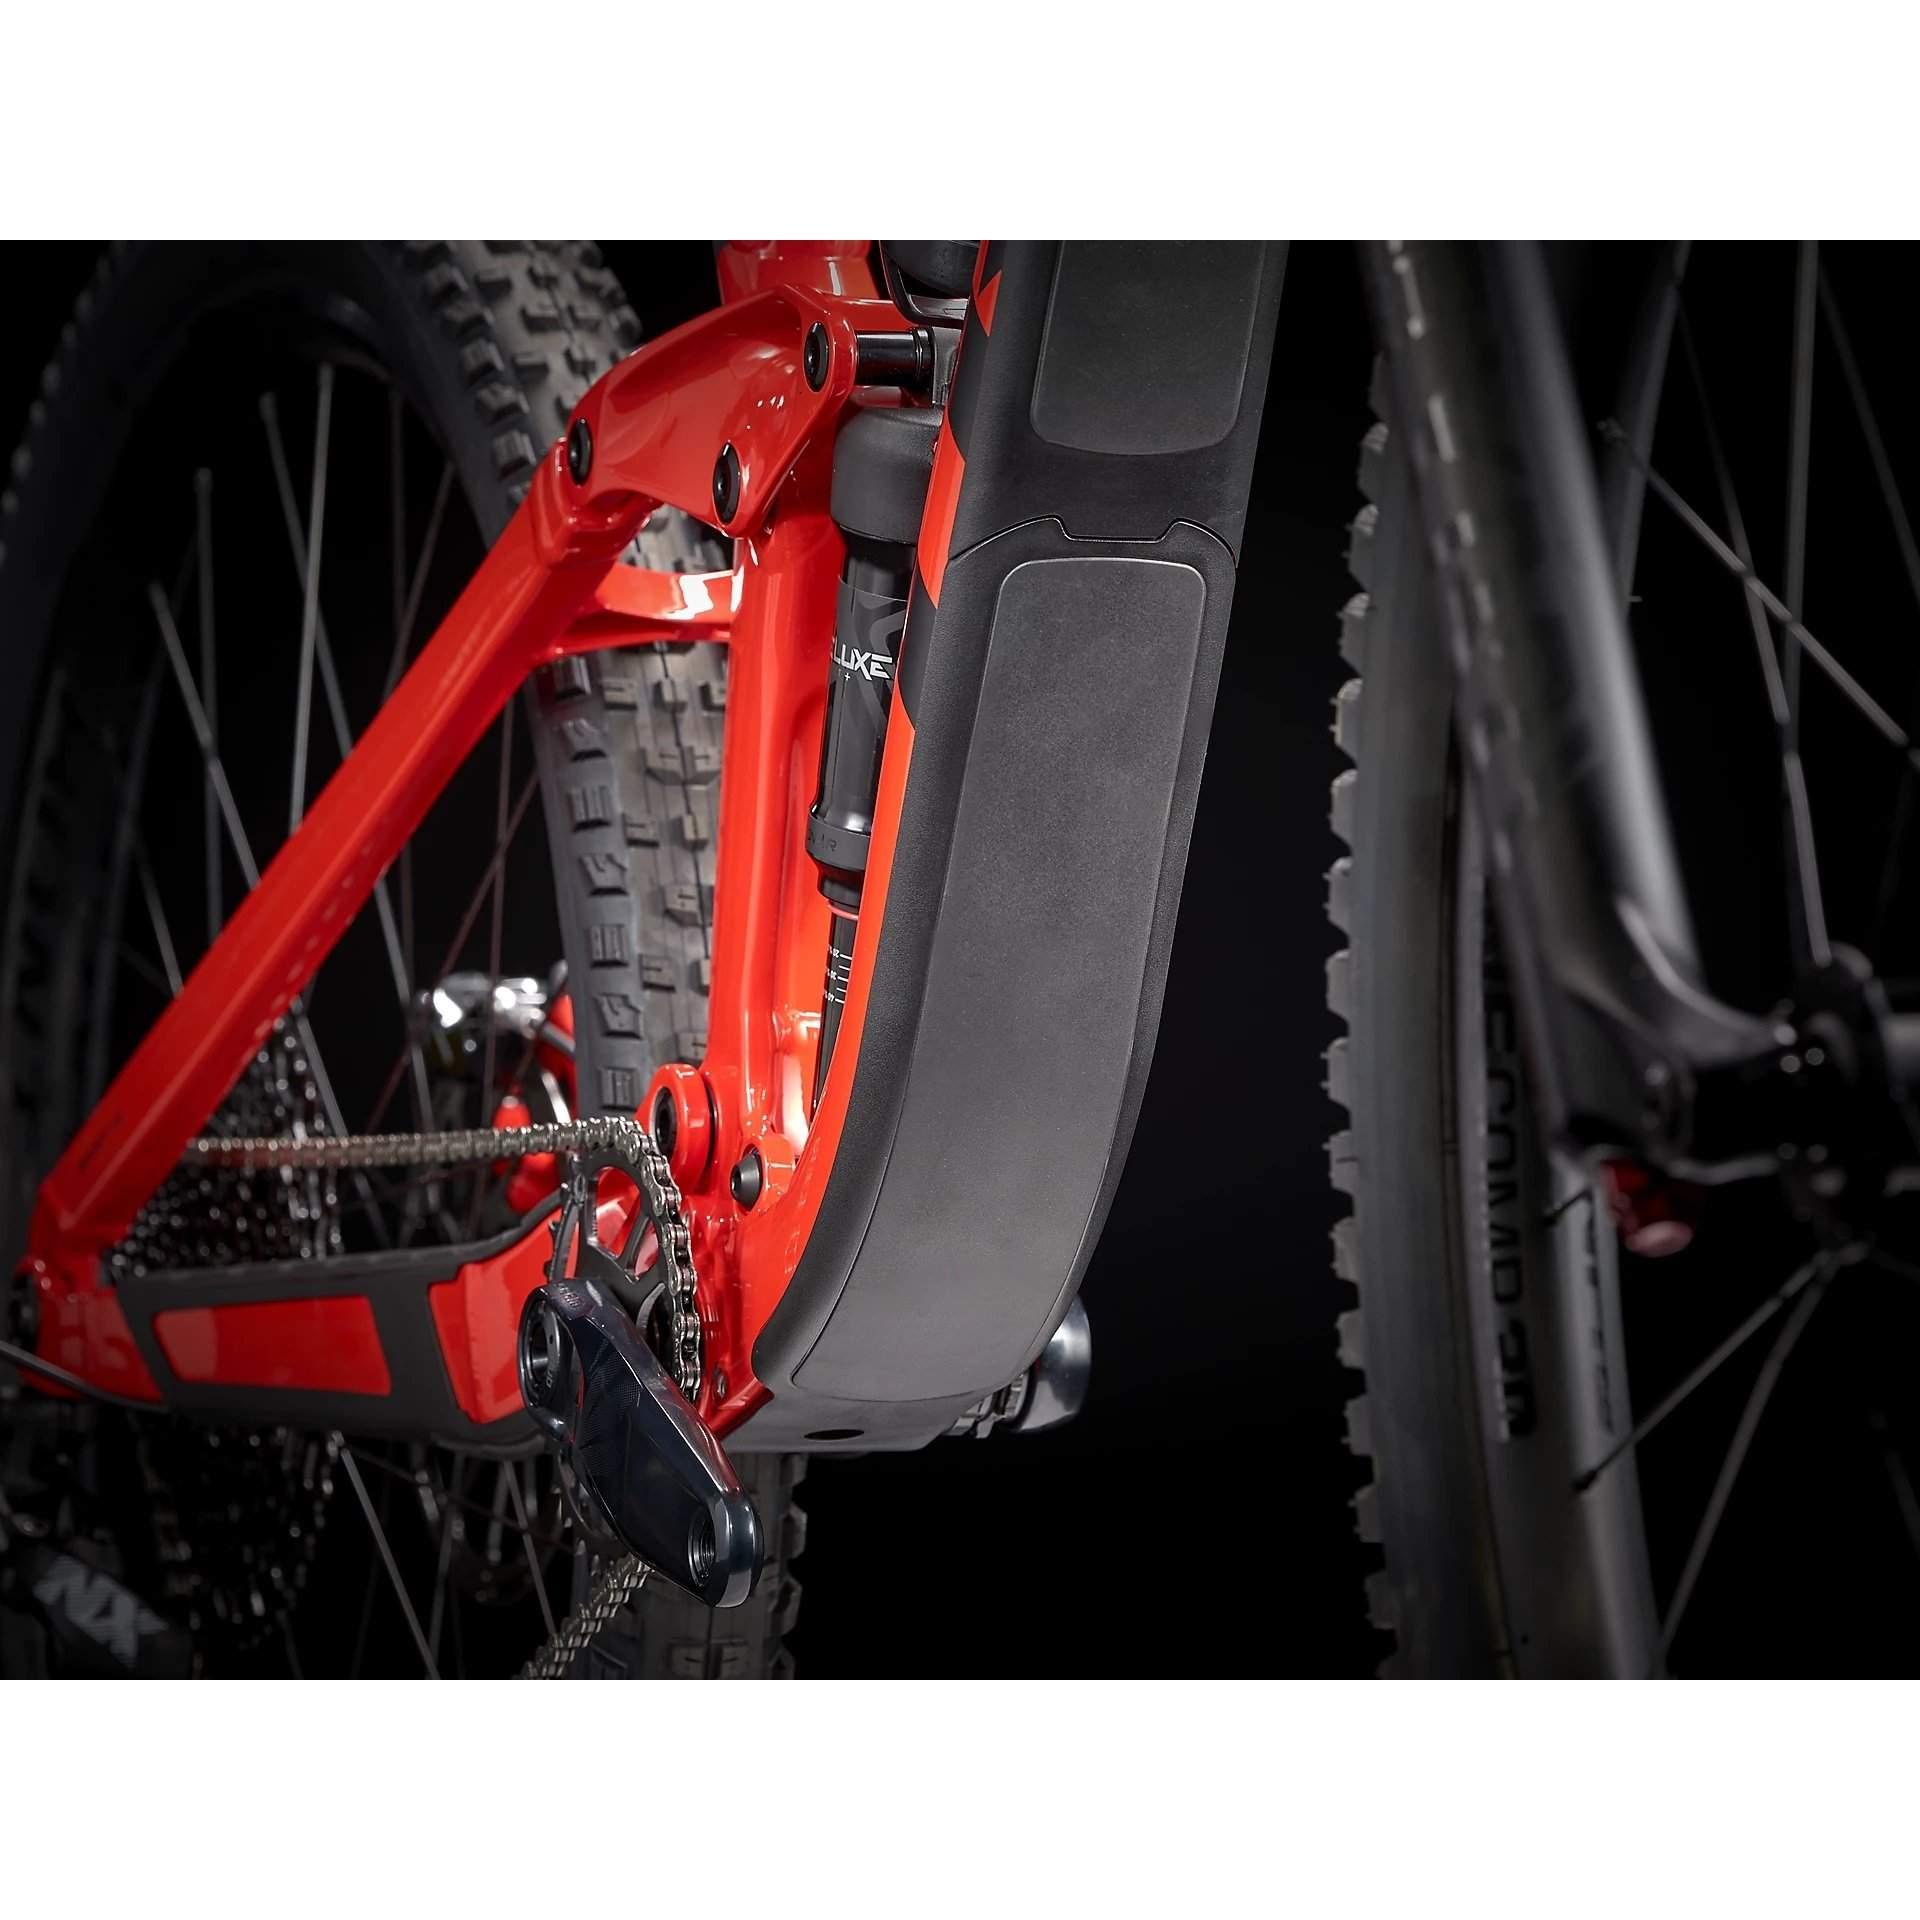 ROWER TREK SLASH 7 GLOSS RADIOACTIVE RED|MATTE BLACK 92